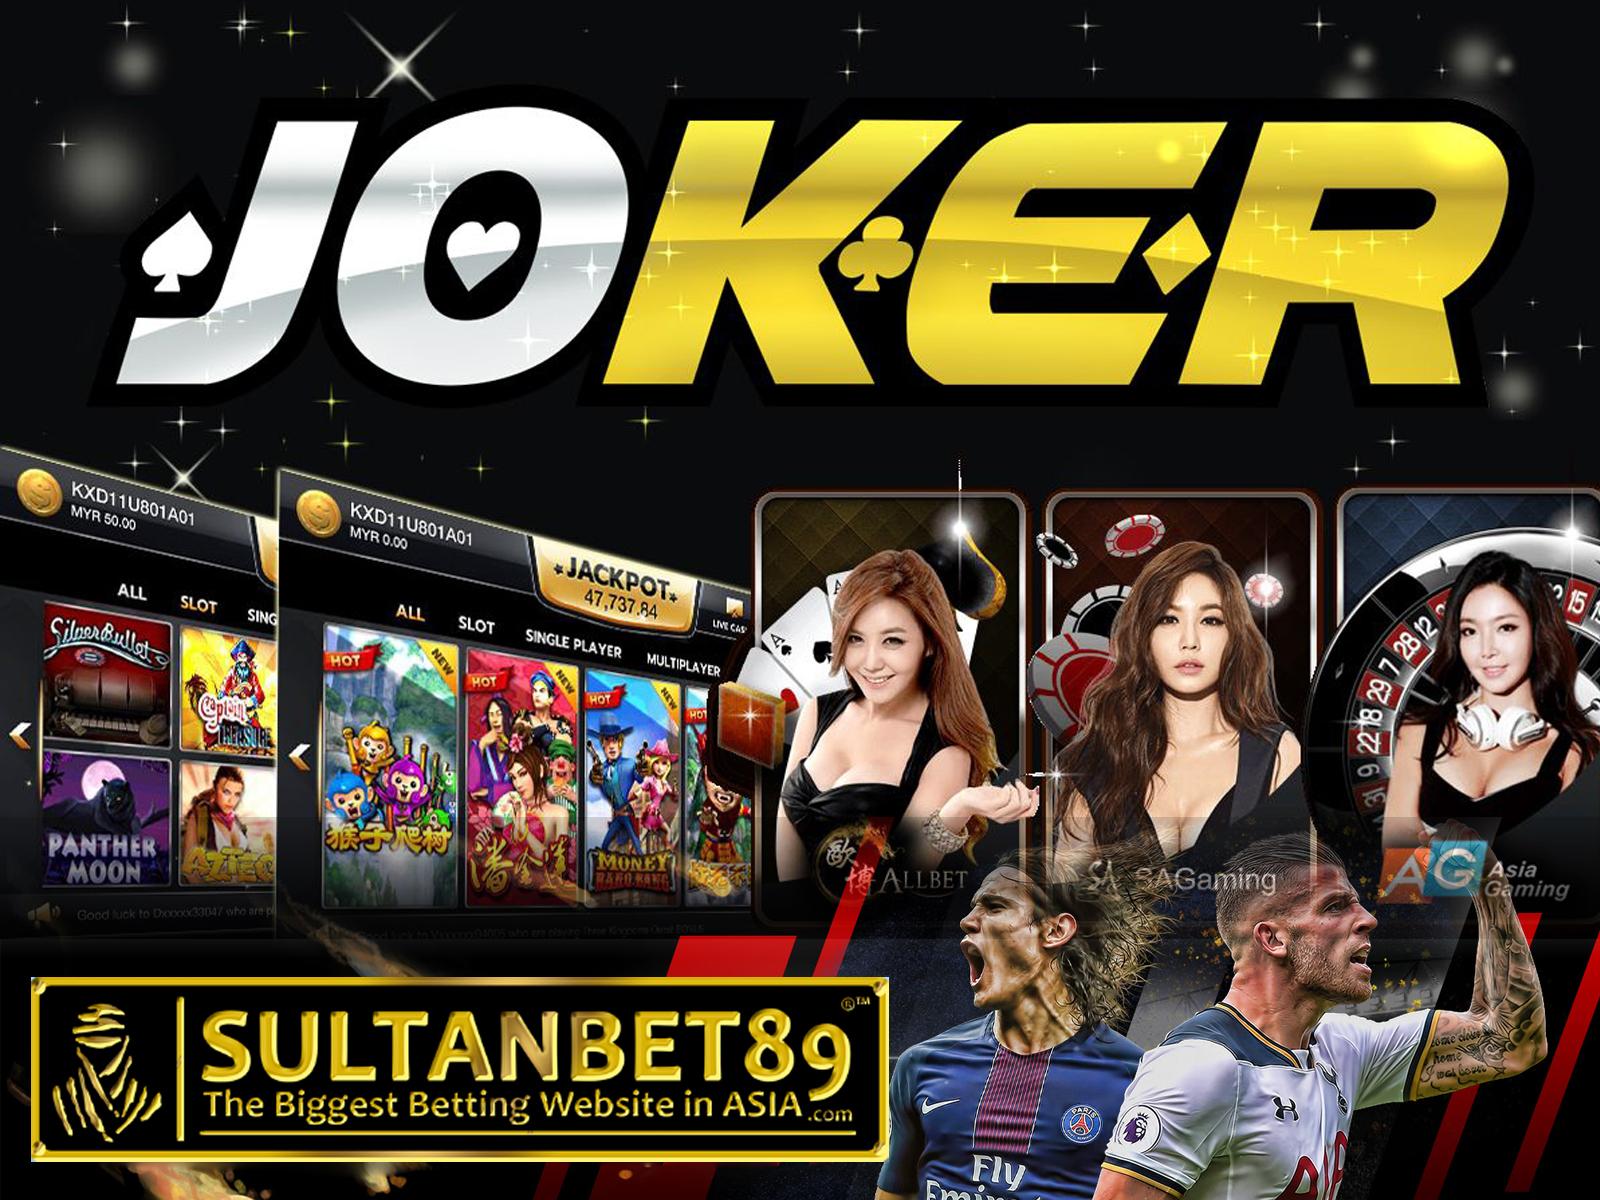 Sultanbet89design Slot Online Terpercaya 2020 By Situs Judi Slot Online Terpercaya 2020 On Dribbble